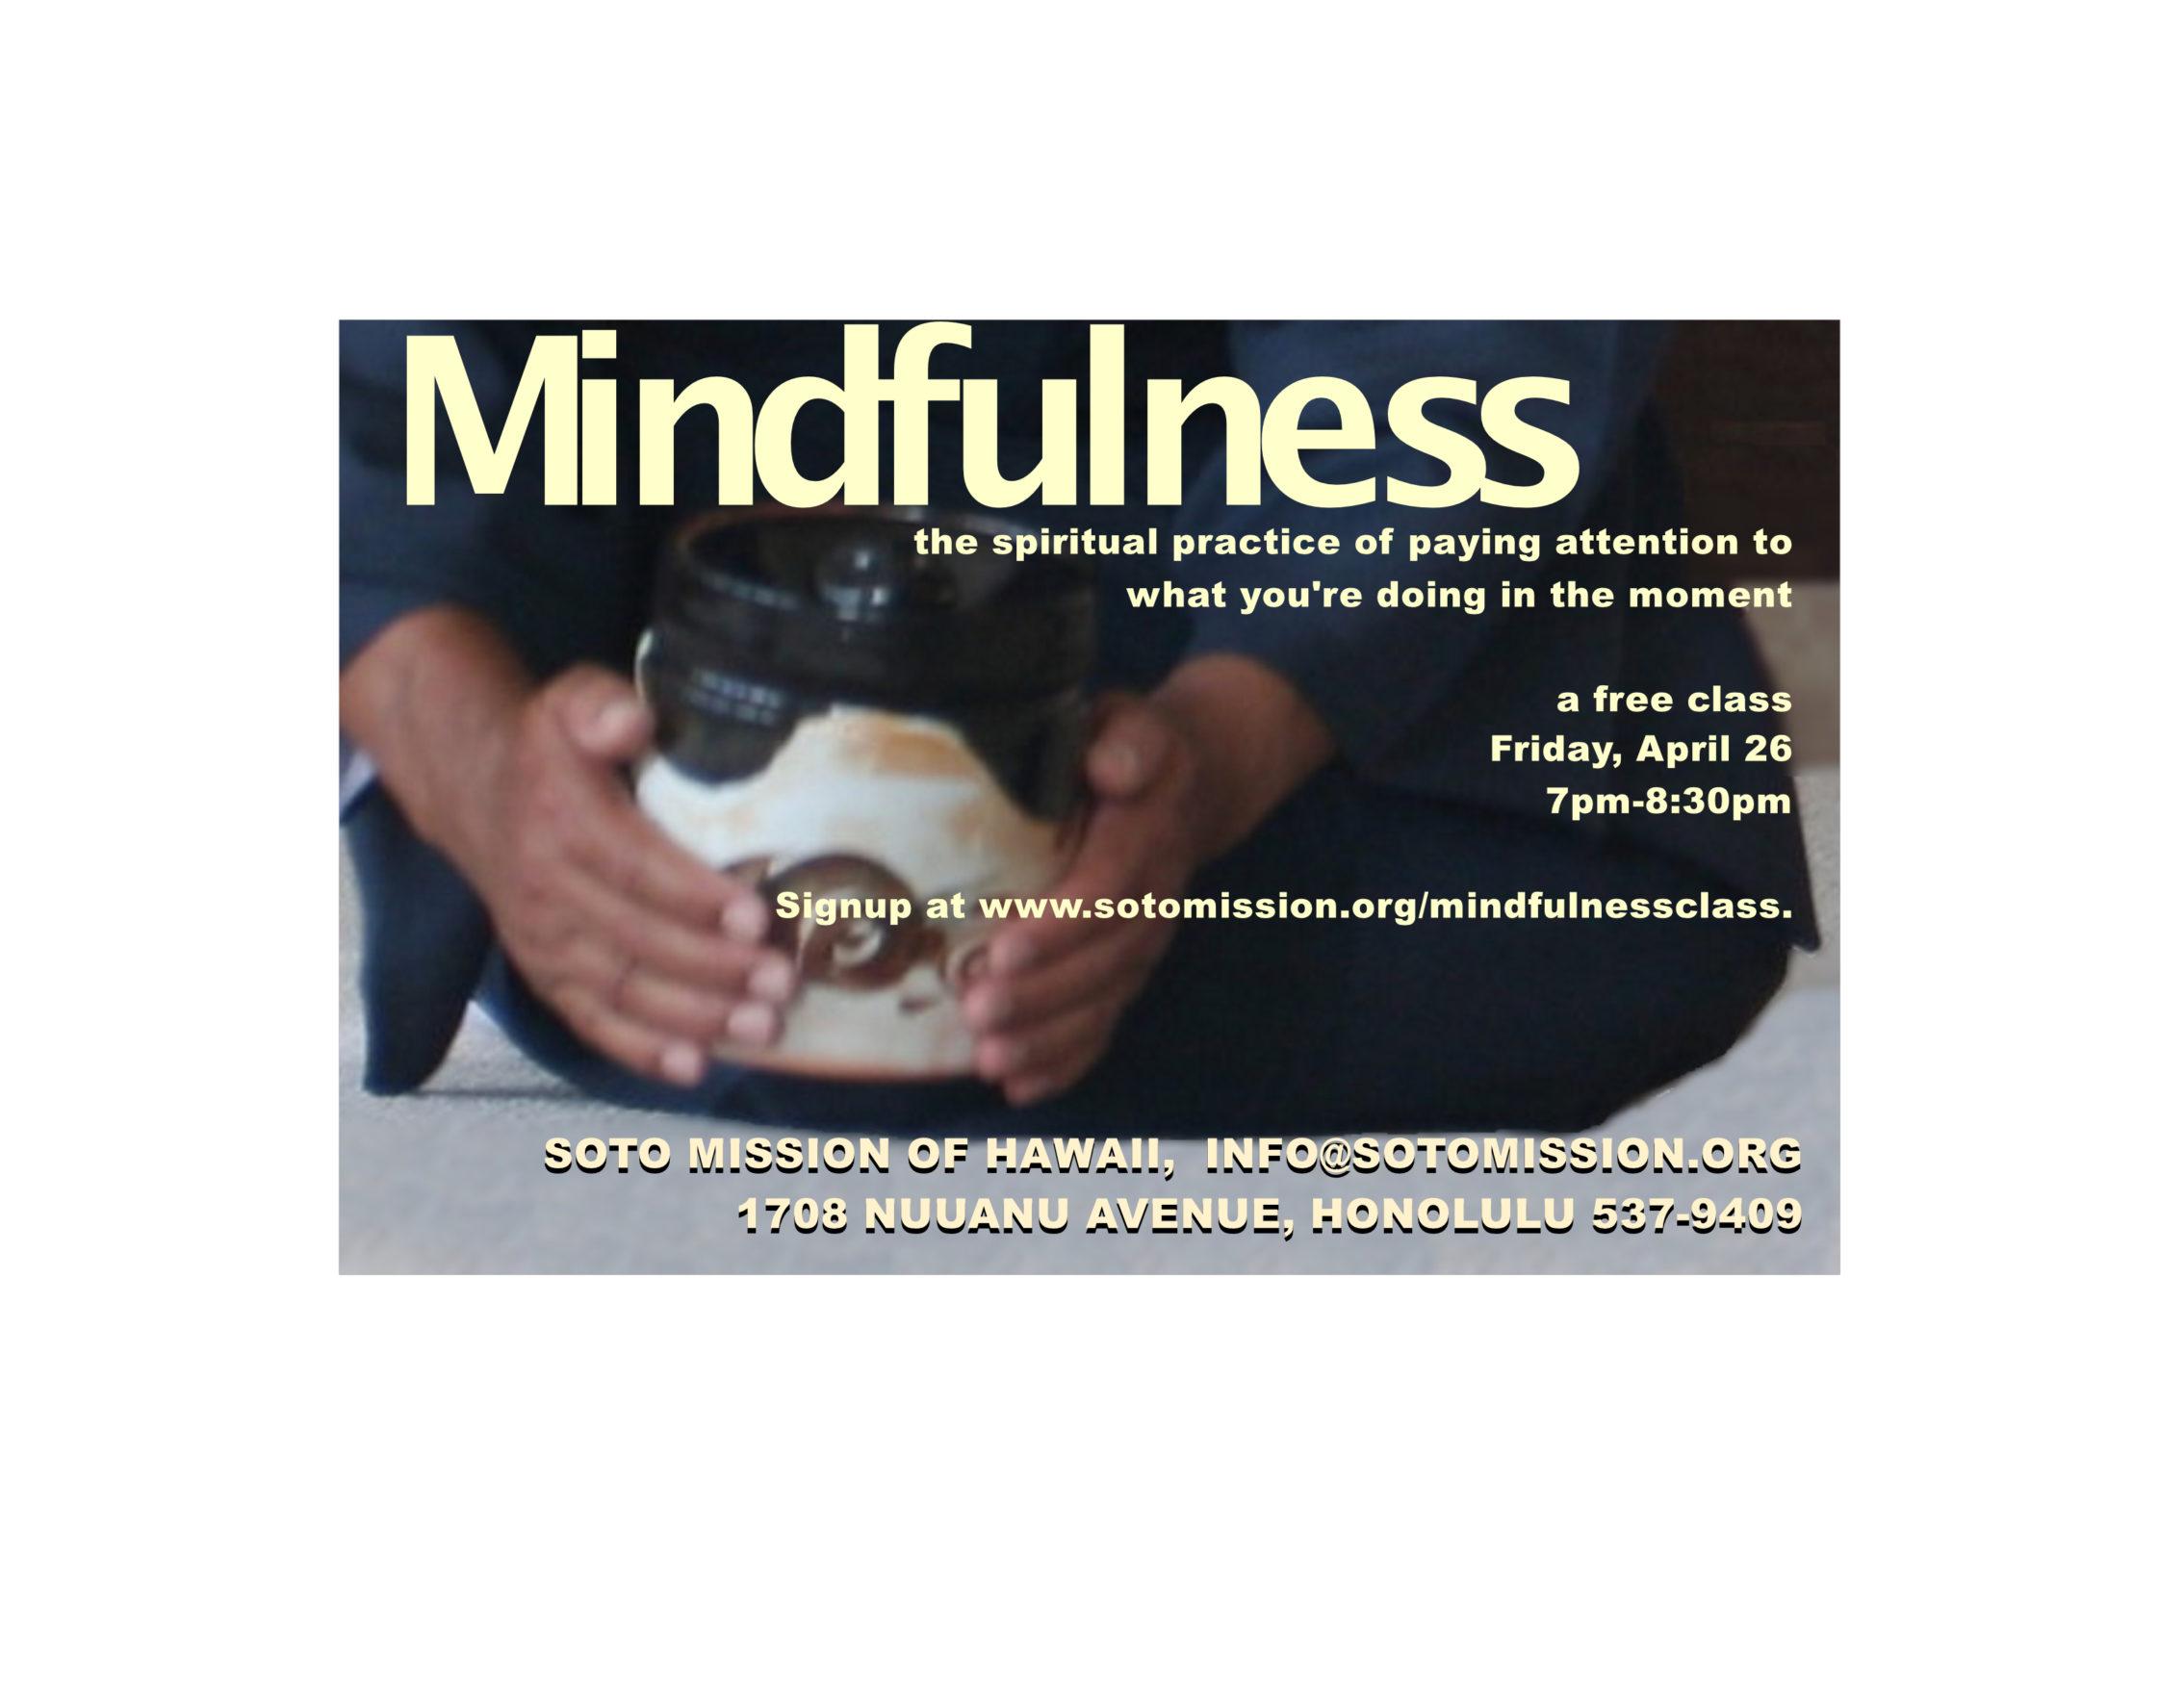 Mindfulness-halfpage-e1548724307940.jpg